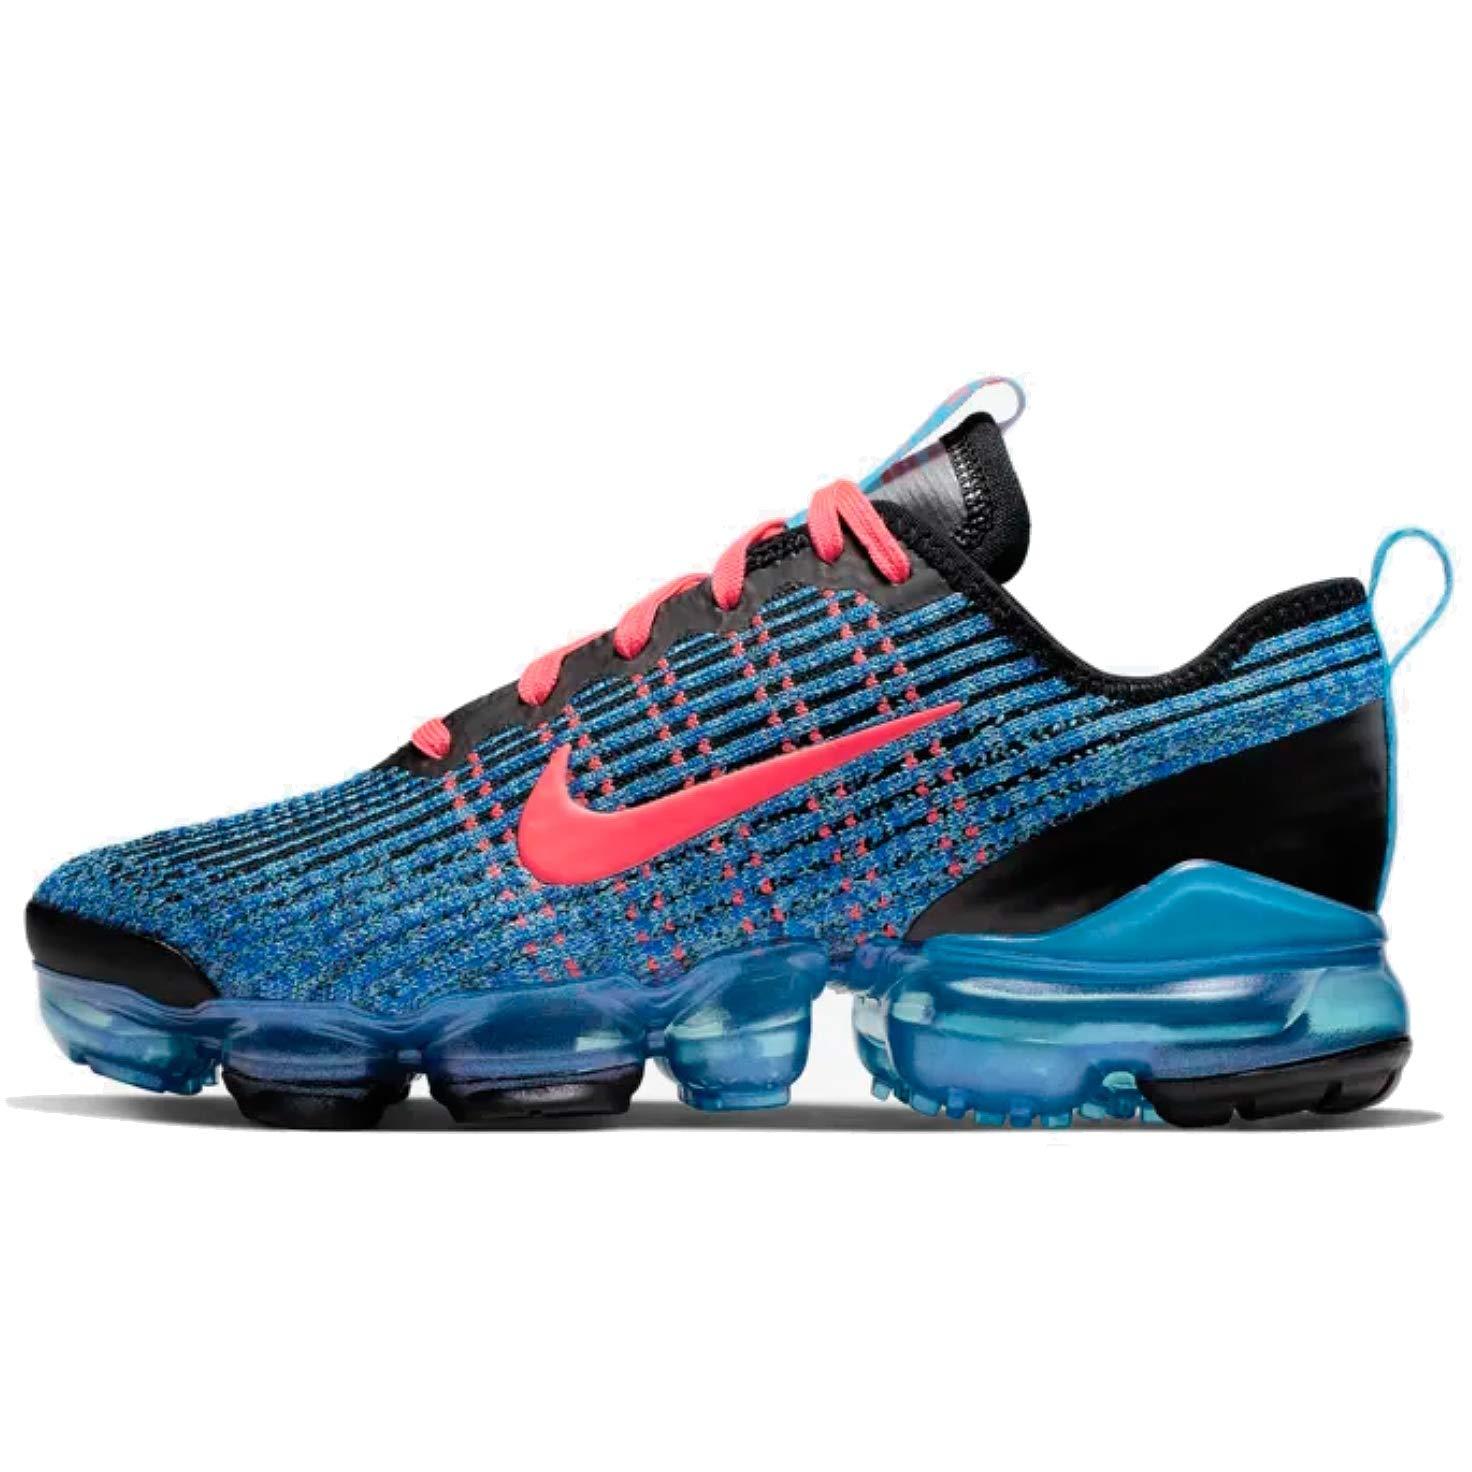 Nike Big Kids AIR Vapormax Flyknit 3